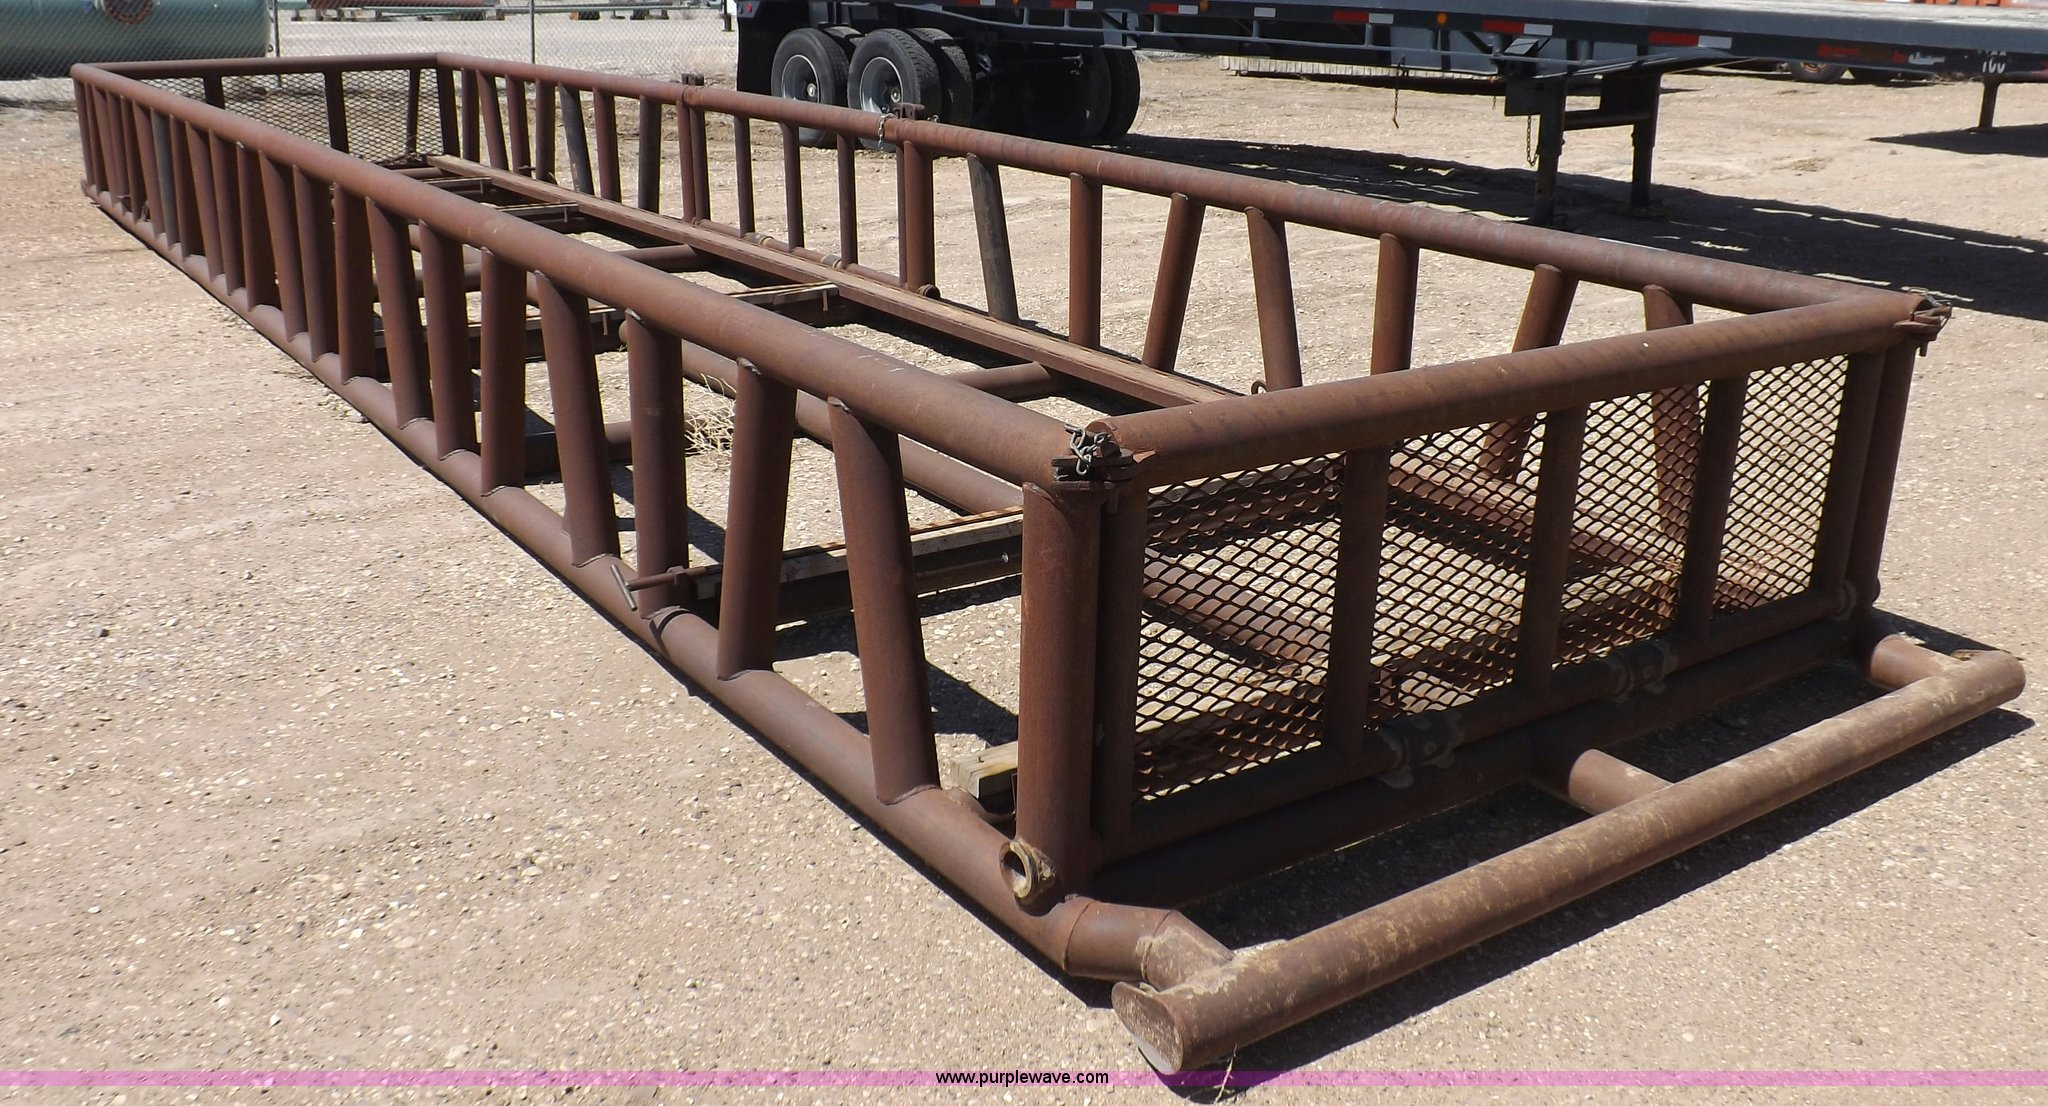 Oilfield pipe basket/skid | Item F8731 | SOLD! July 11 Const